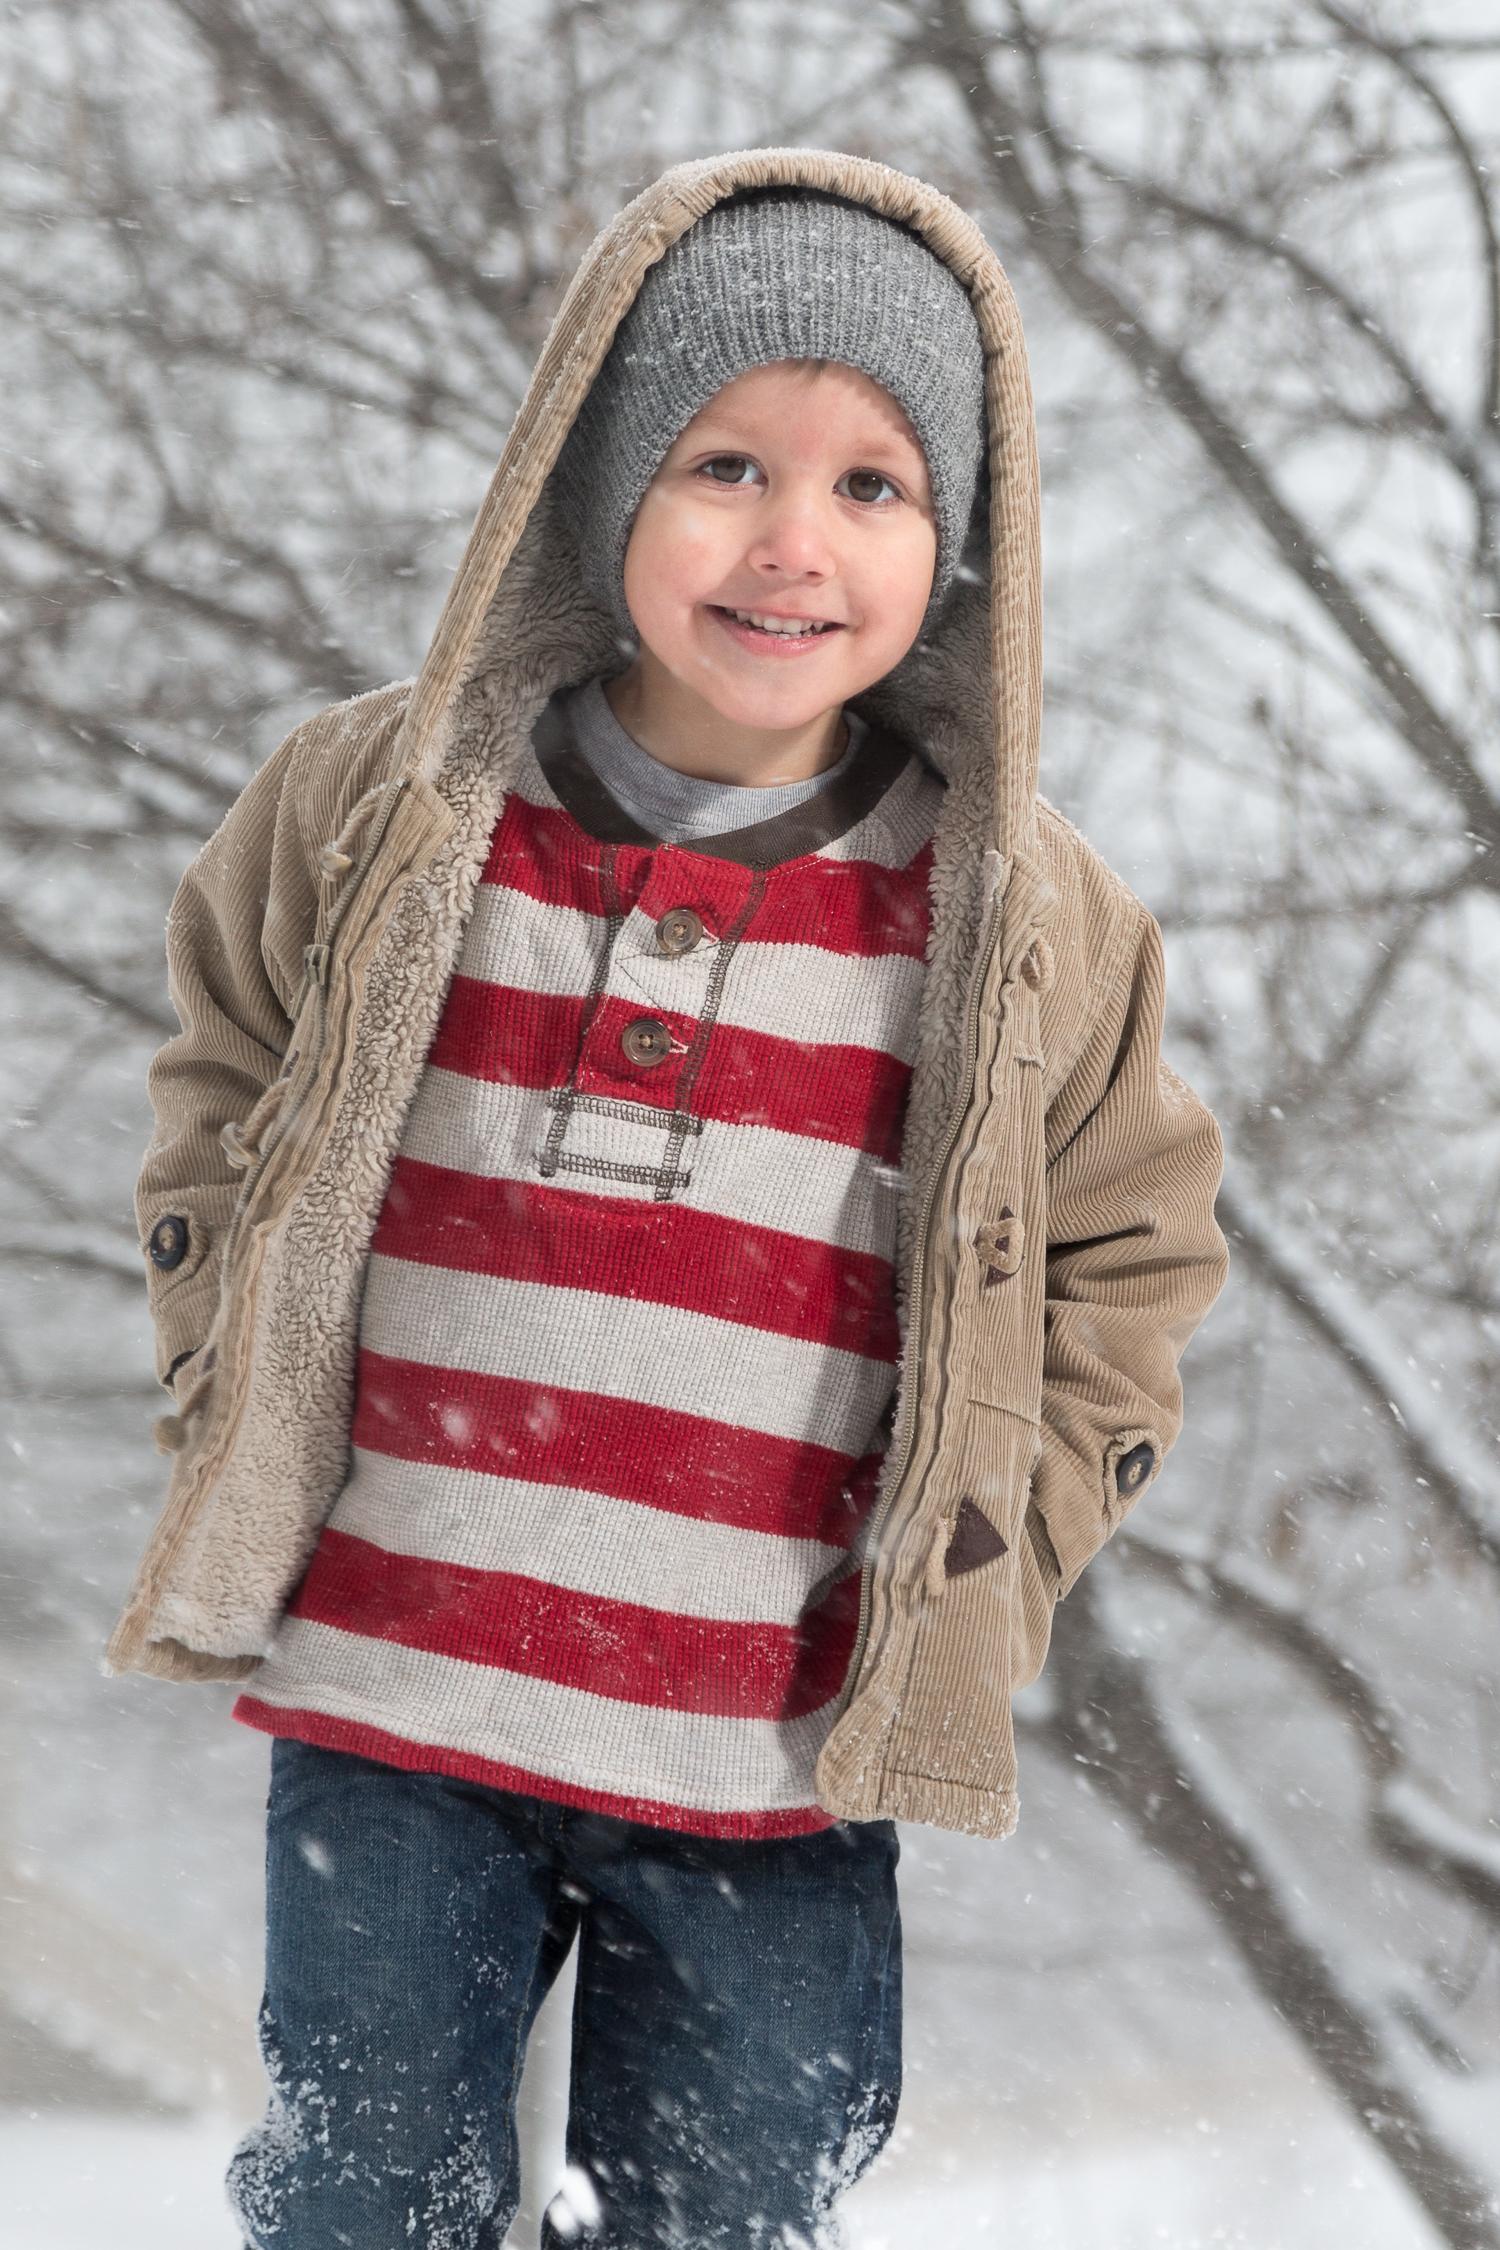 what to wear for children's photos - kansas city children's photographer - www.anthem-photo.com